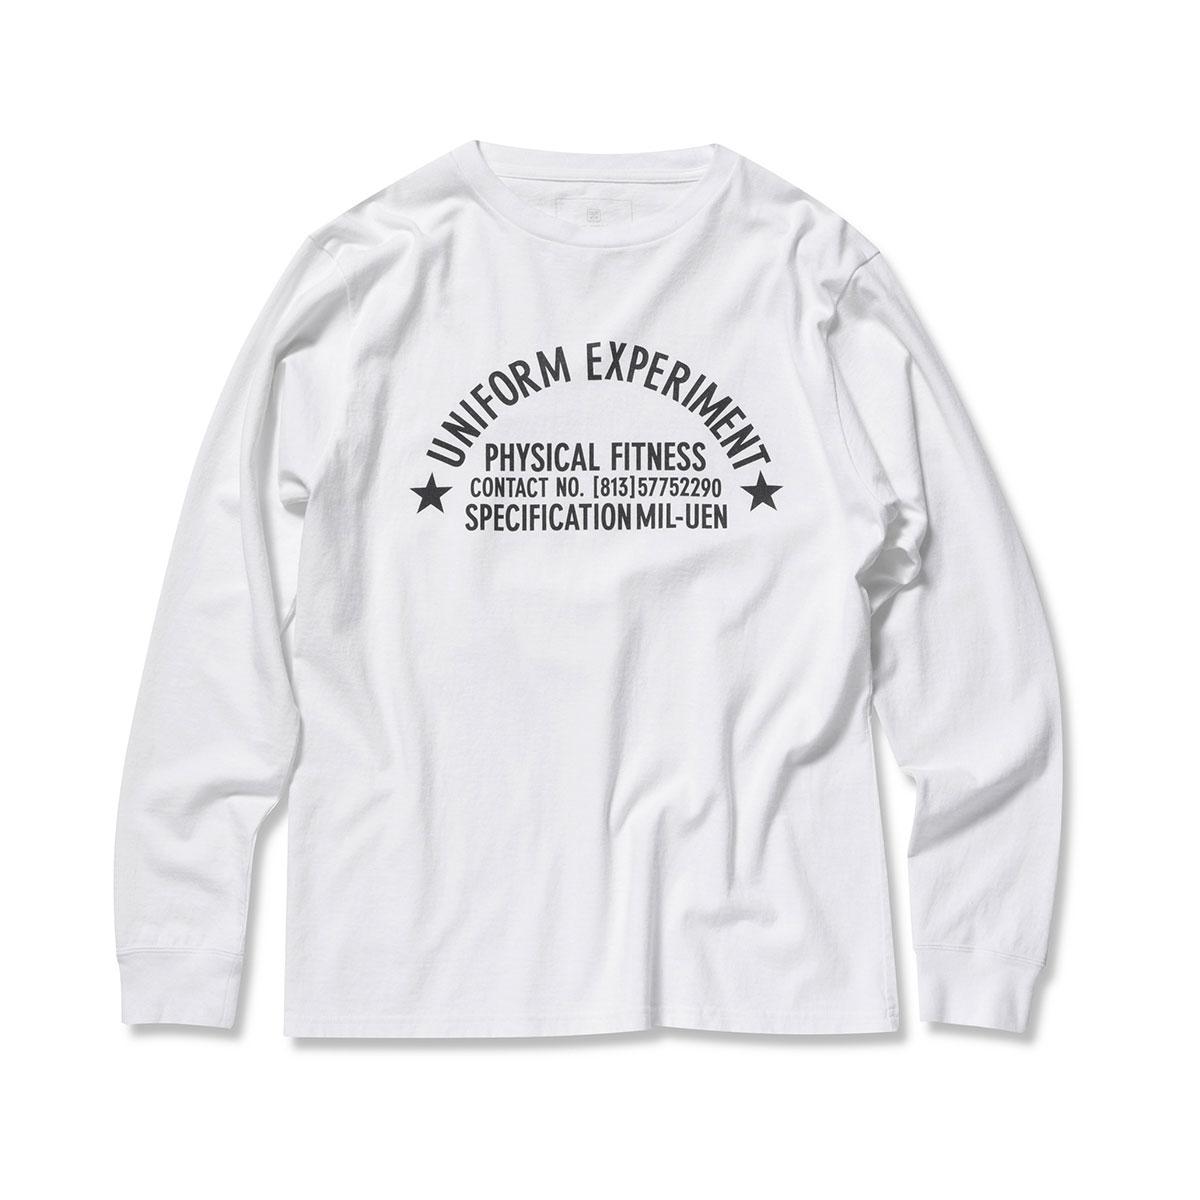 uniform experiment / UEN PHYSICAL FITNESS LONG SLEEVE TEE -WHITE